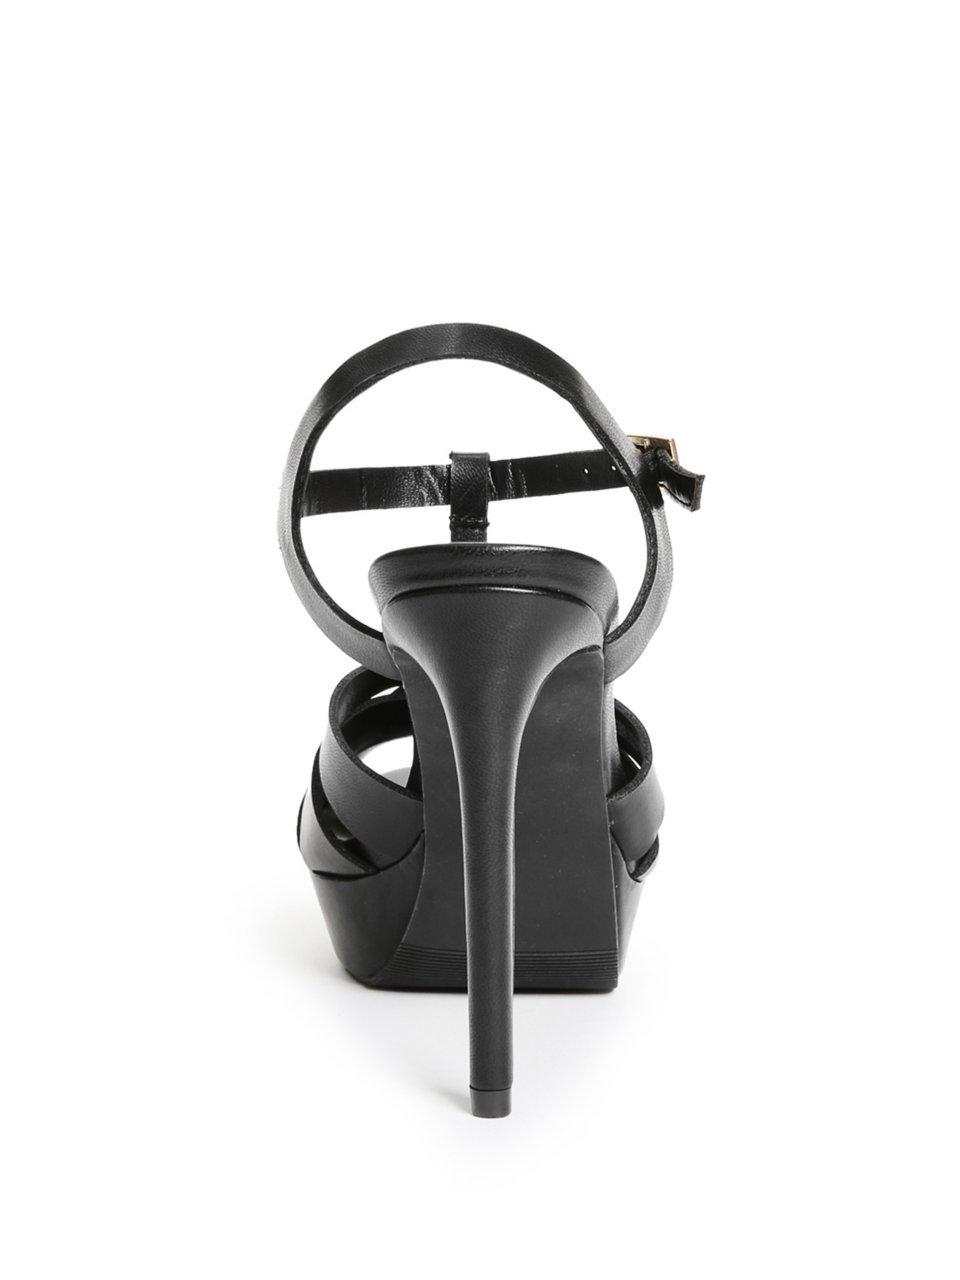 GUESS Women's Cassy Strappy Platform US|Black Heels B07CYWZ7P6 5.5 M US|Black Platform 52760f